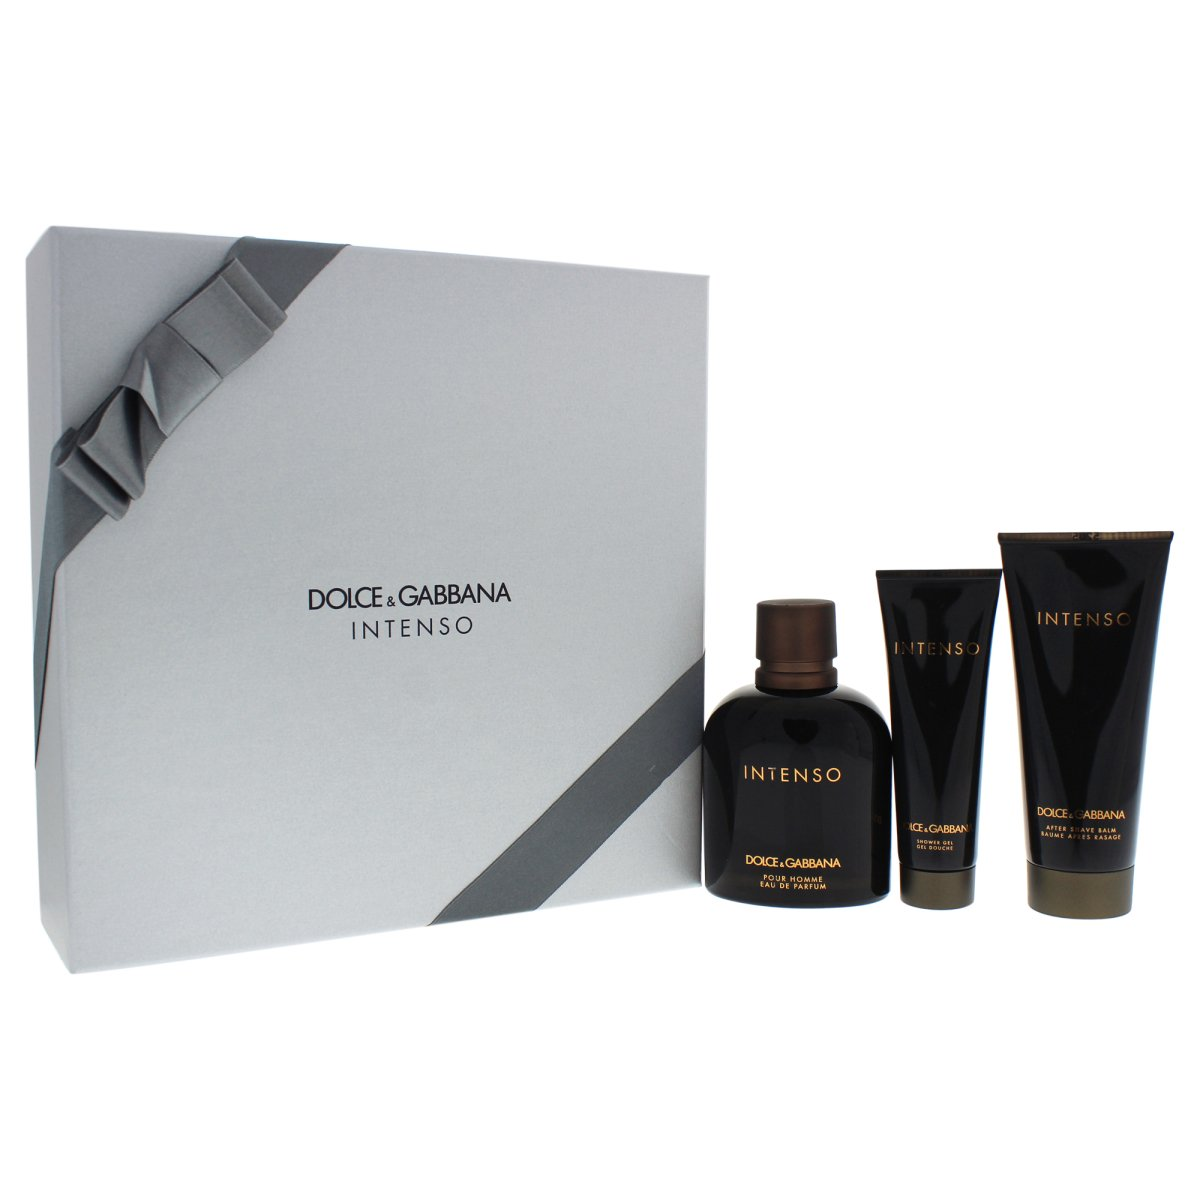 Dolce & Gabbana Intenso Pour Homme, Dárková sada, parfémovaná voda 125ml + balzám po holení 100ml + sprchový gel 50ml , Pánska vôňa